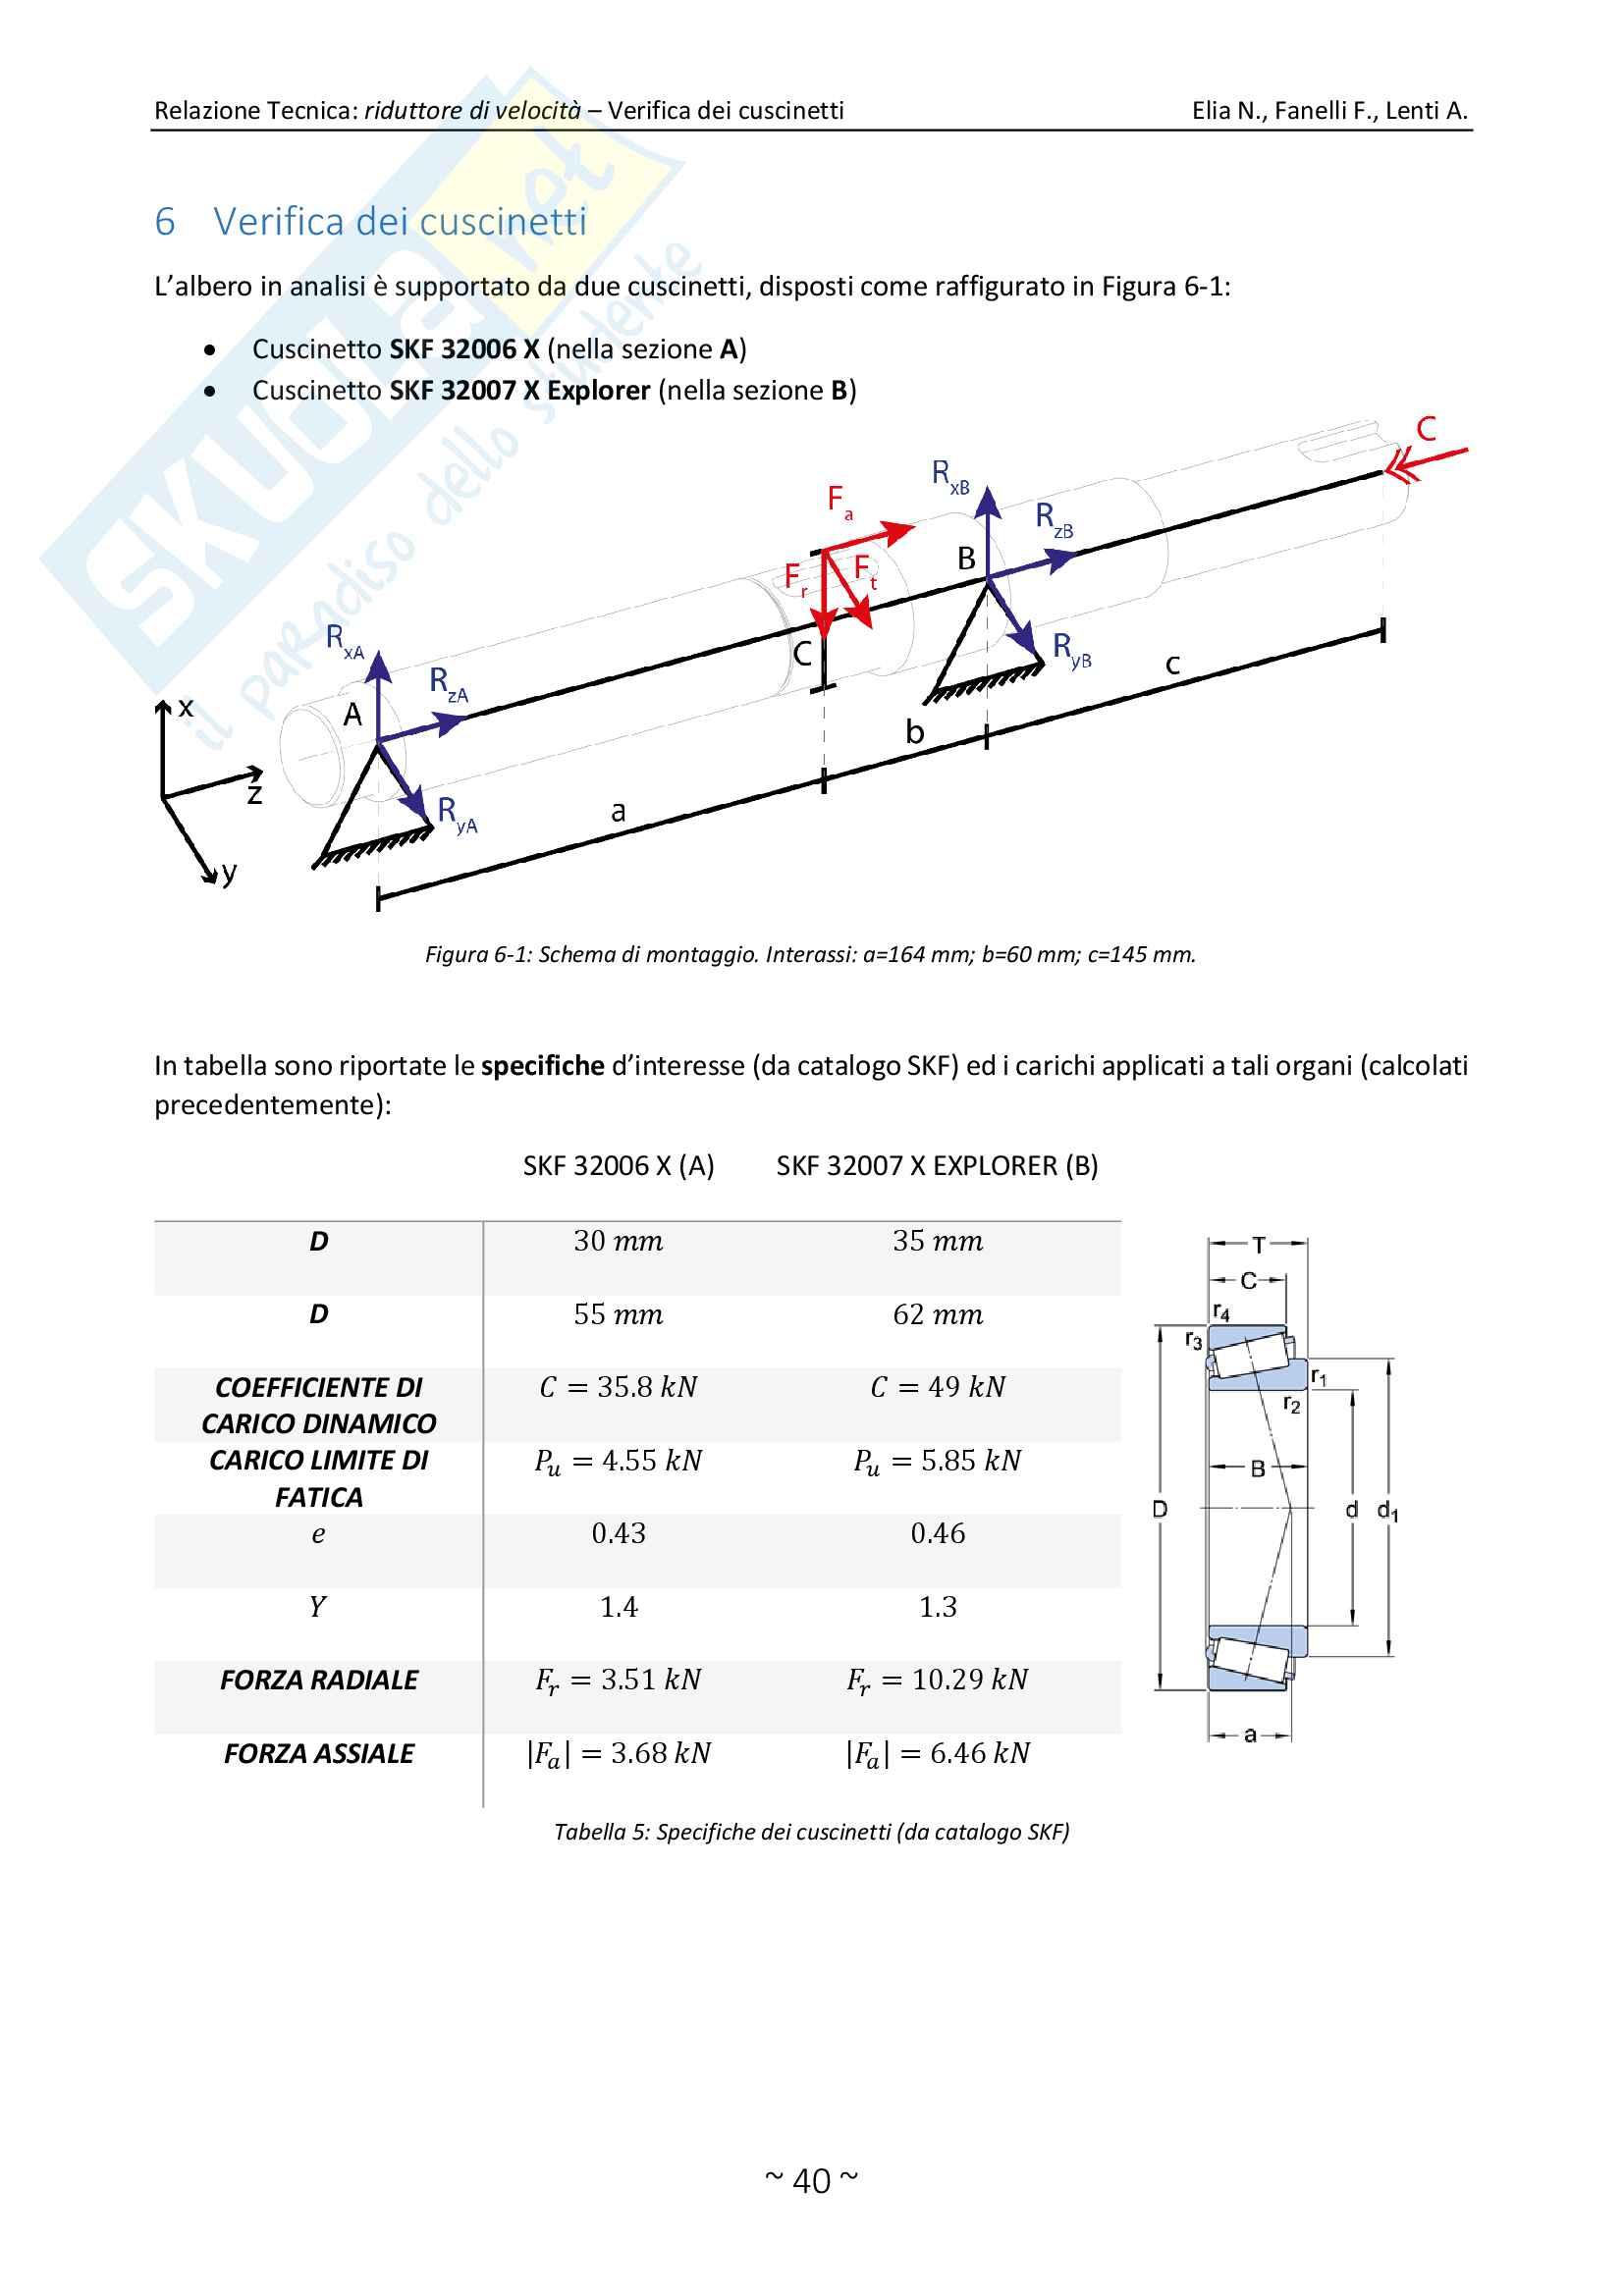 Relazione Tecnica Perfetta, Costruzione di Macchine, Berruti, Brusa Pag. 41